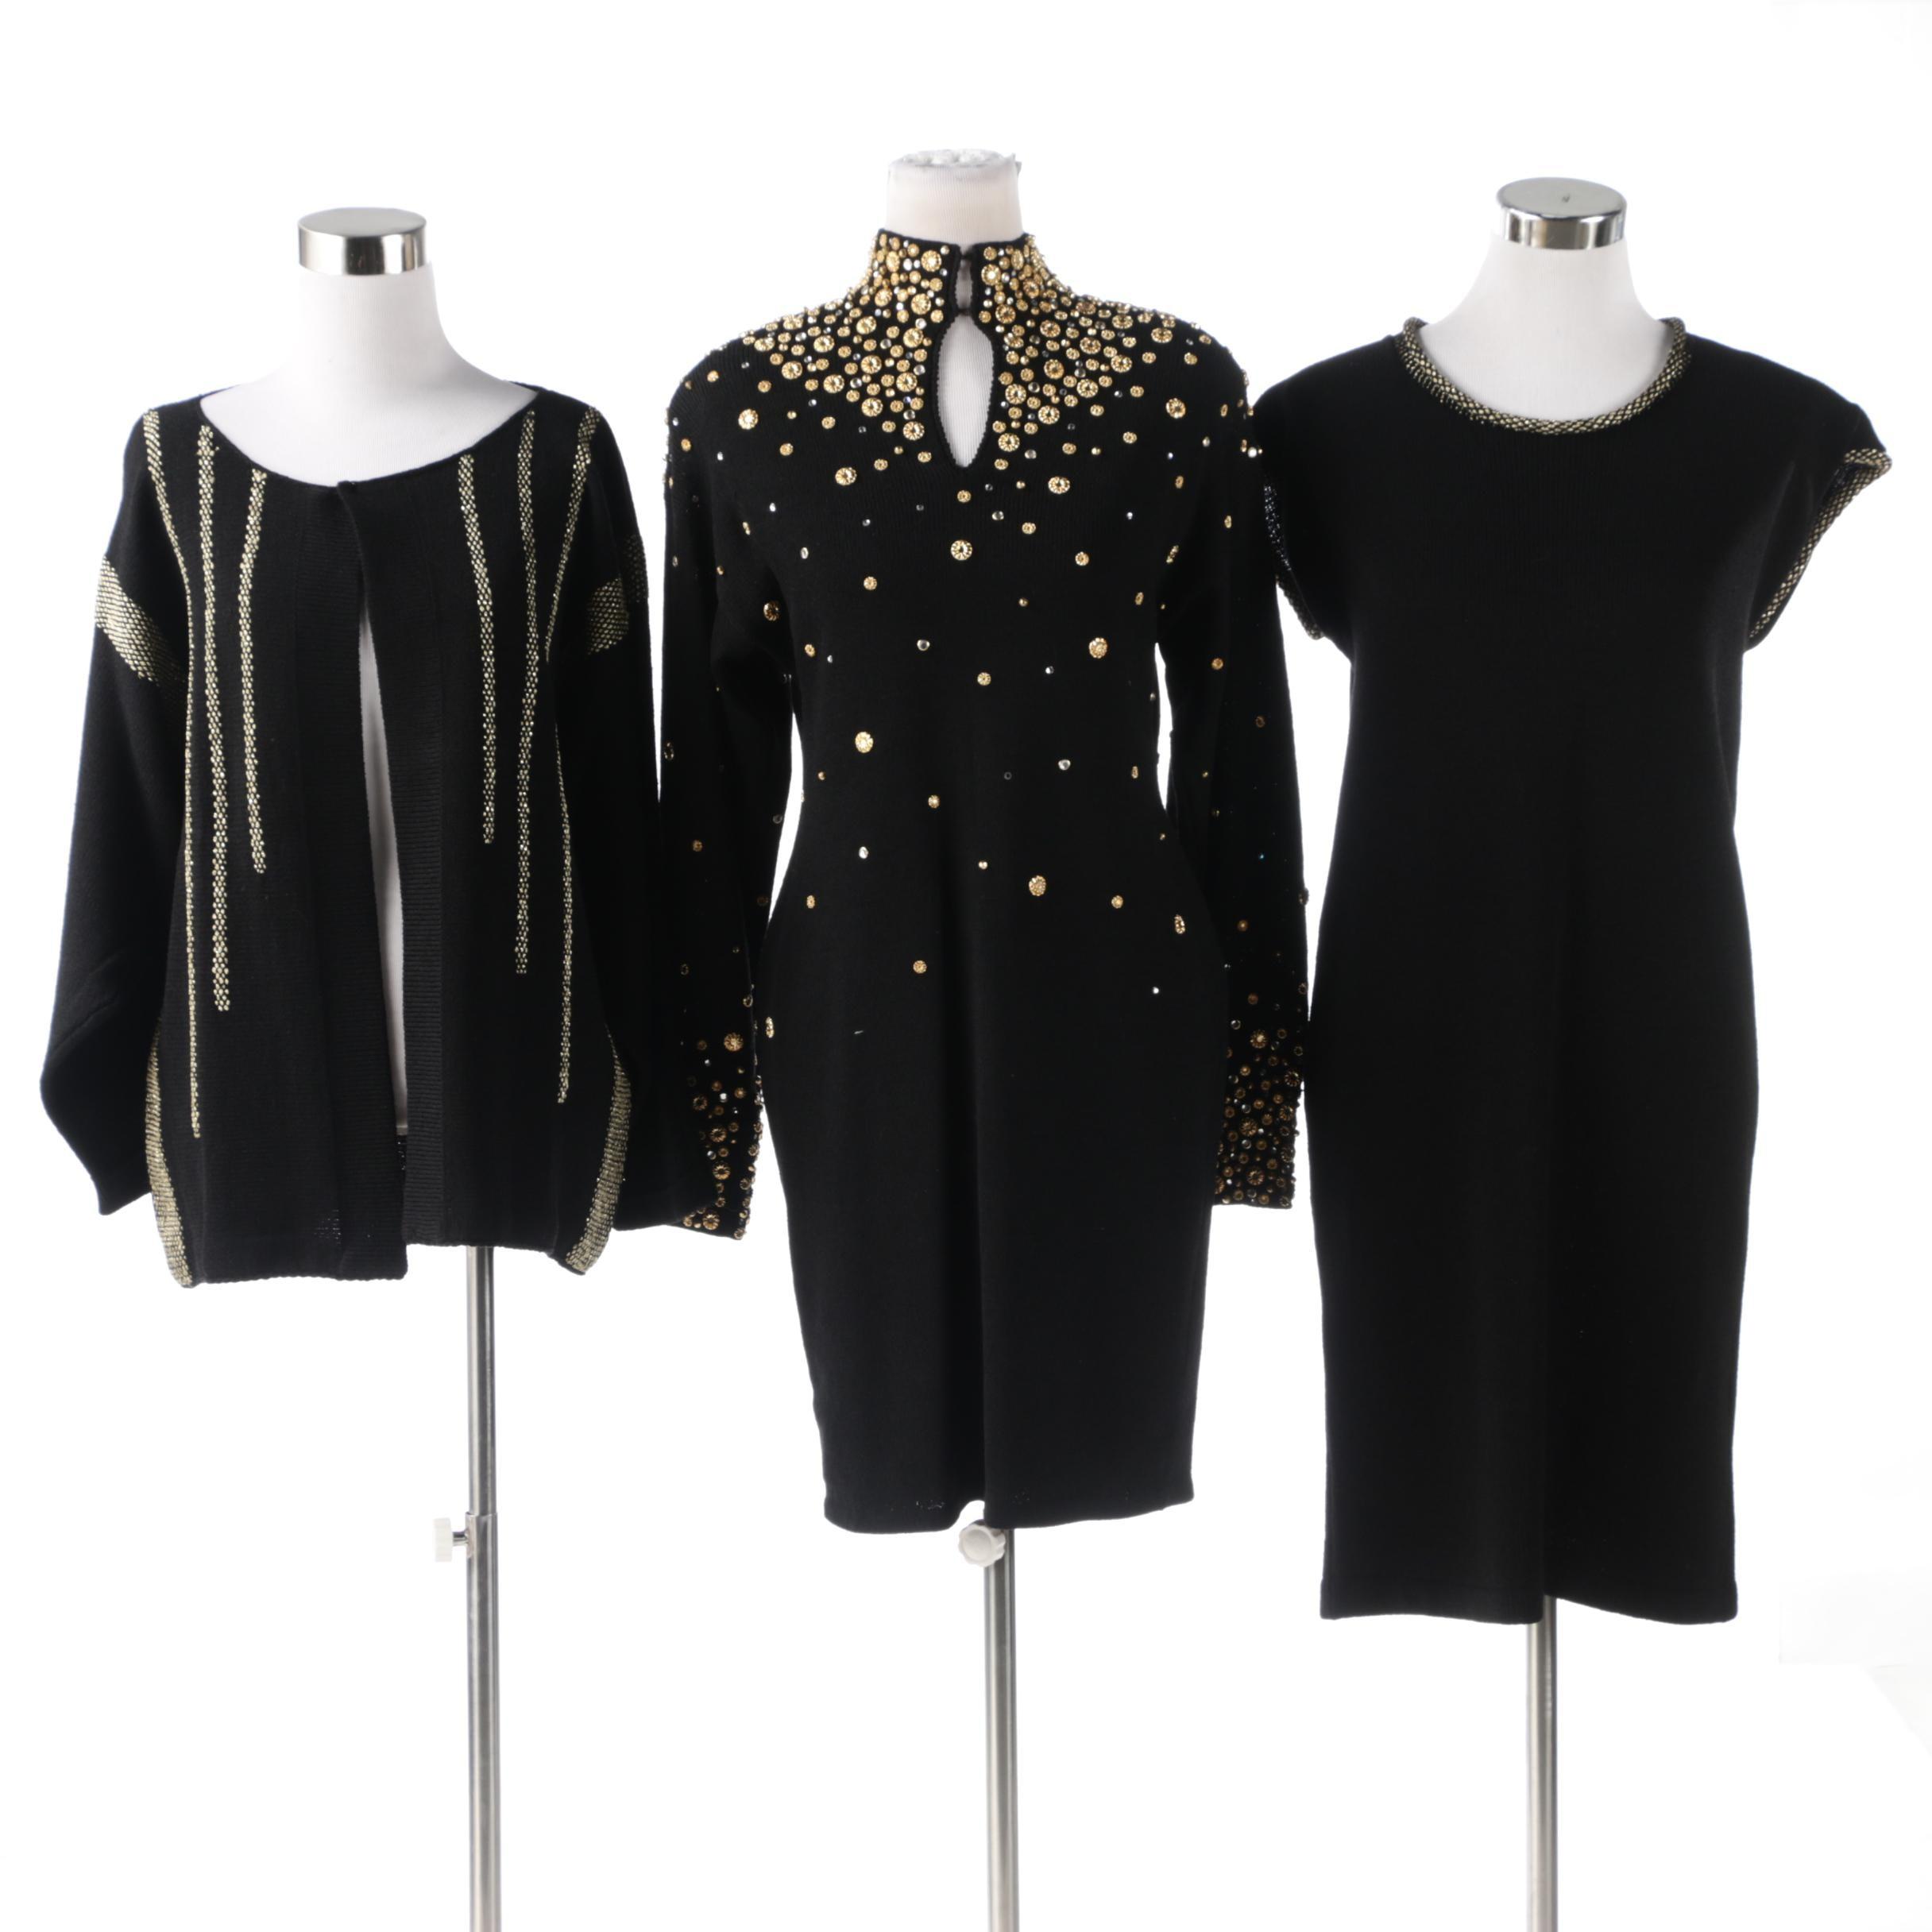 Mina and Elizabeth Black Knit Dresses with Metallic Gold and Rhinestones